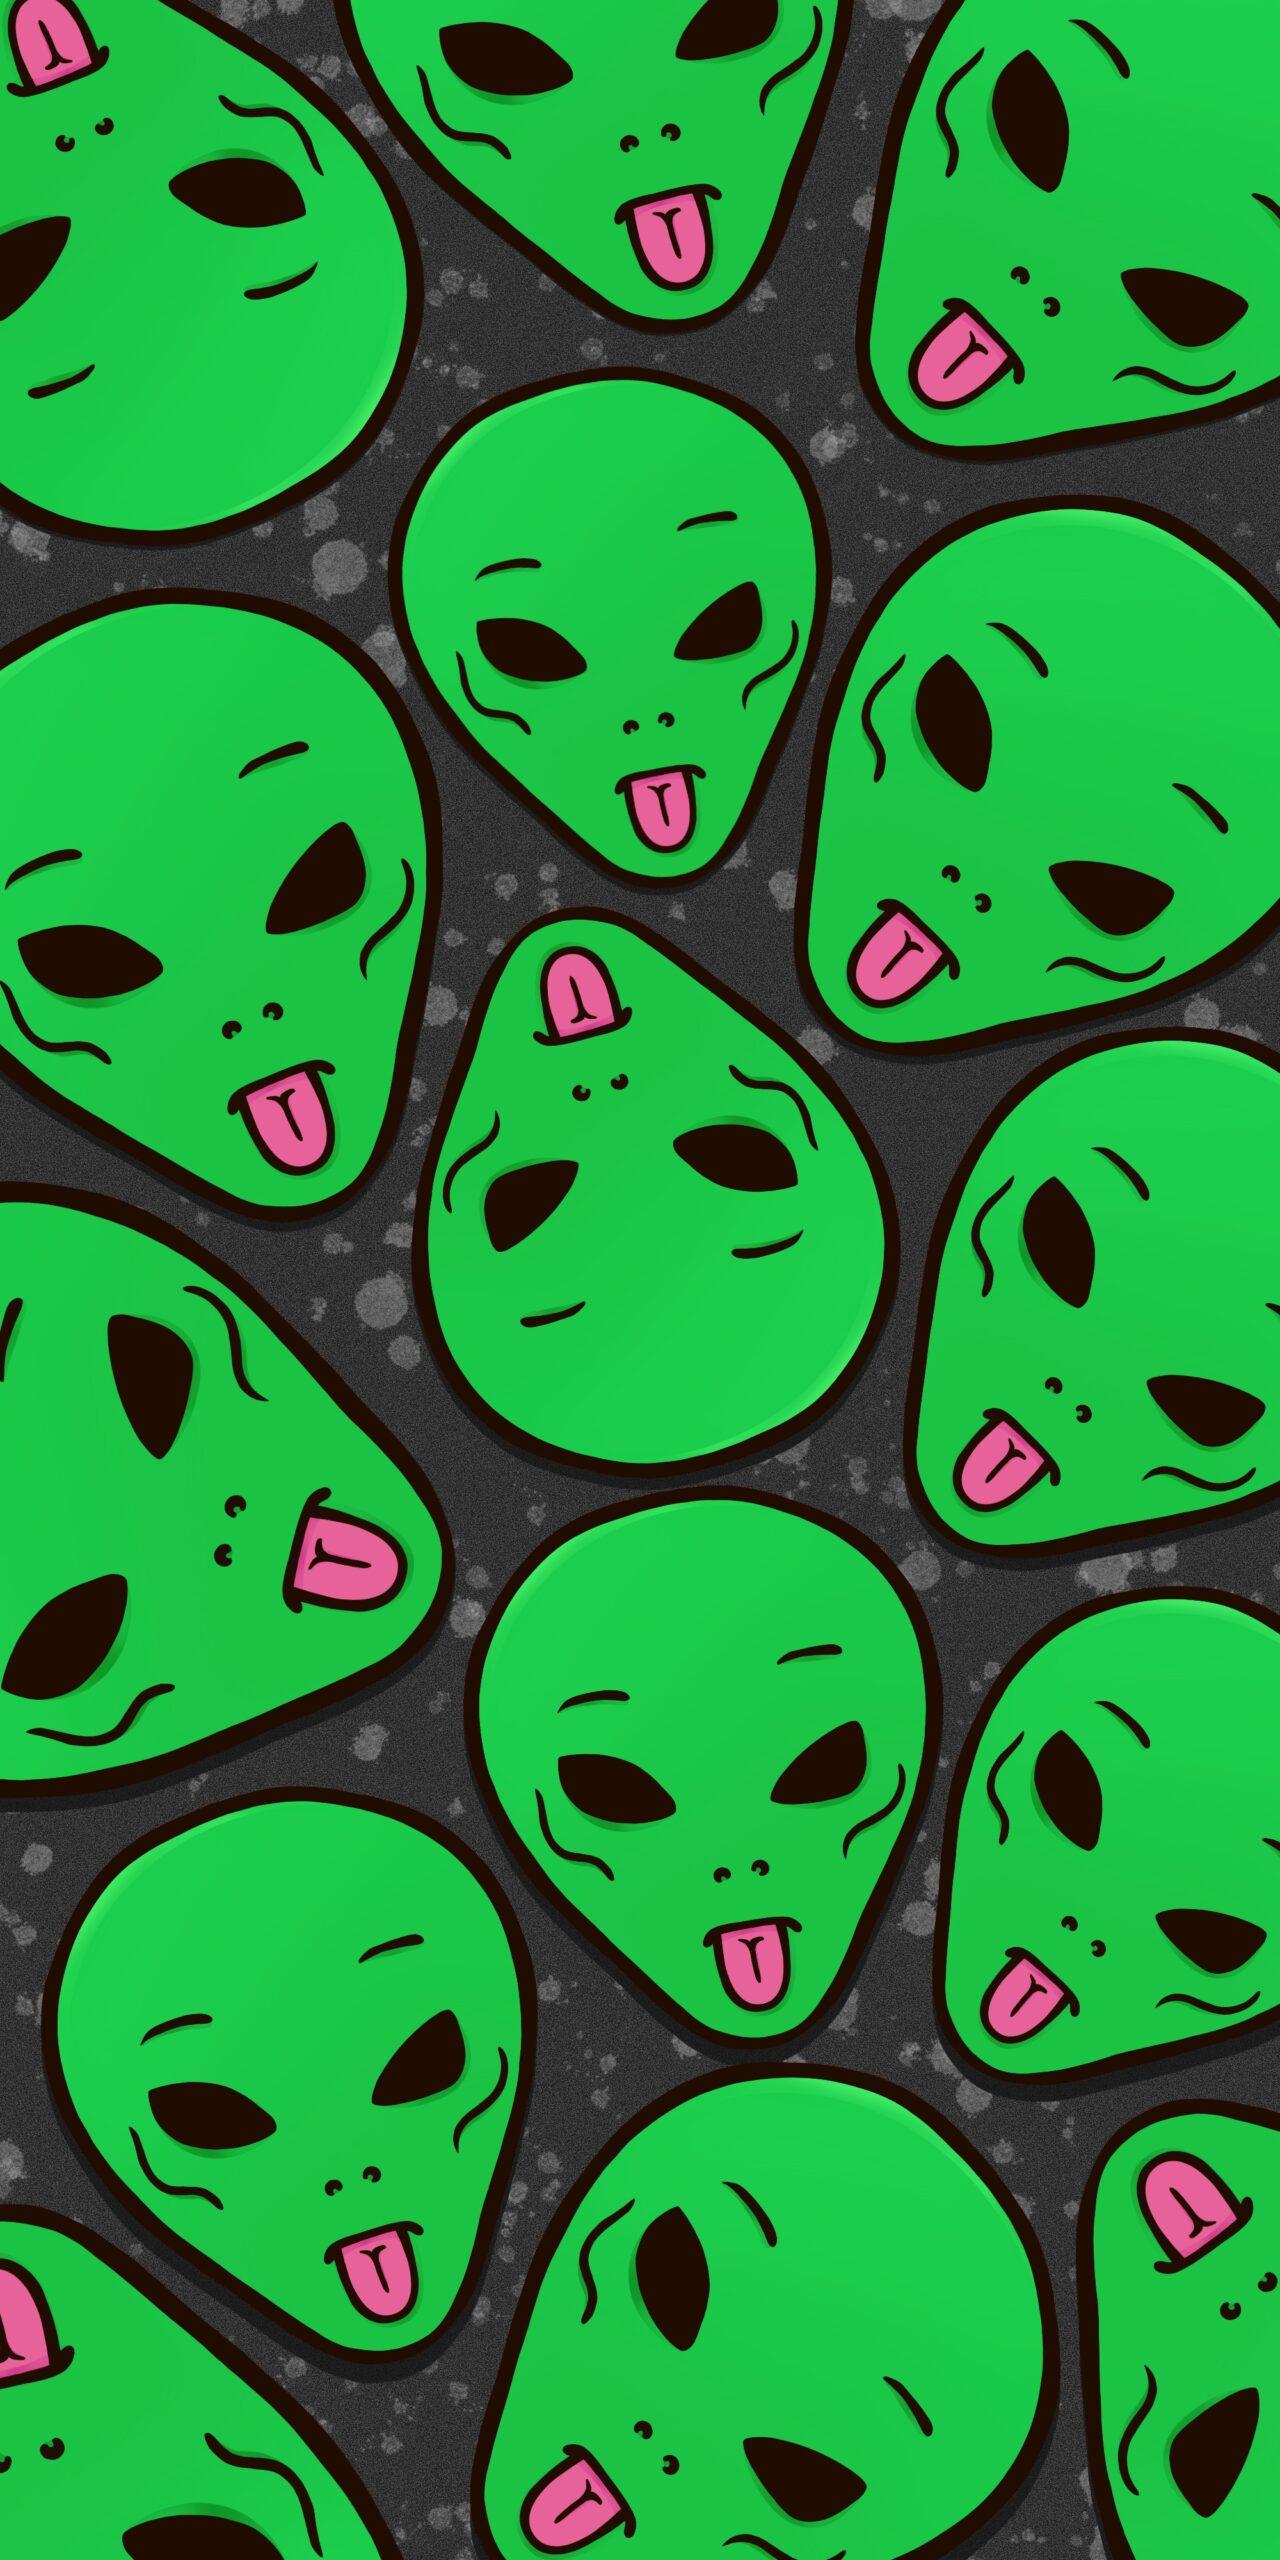 ripndip lord alien green dark wallpaper